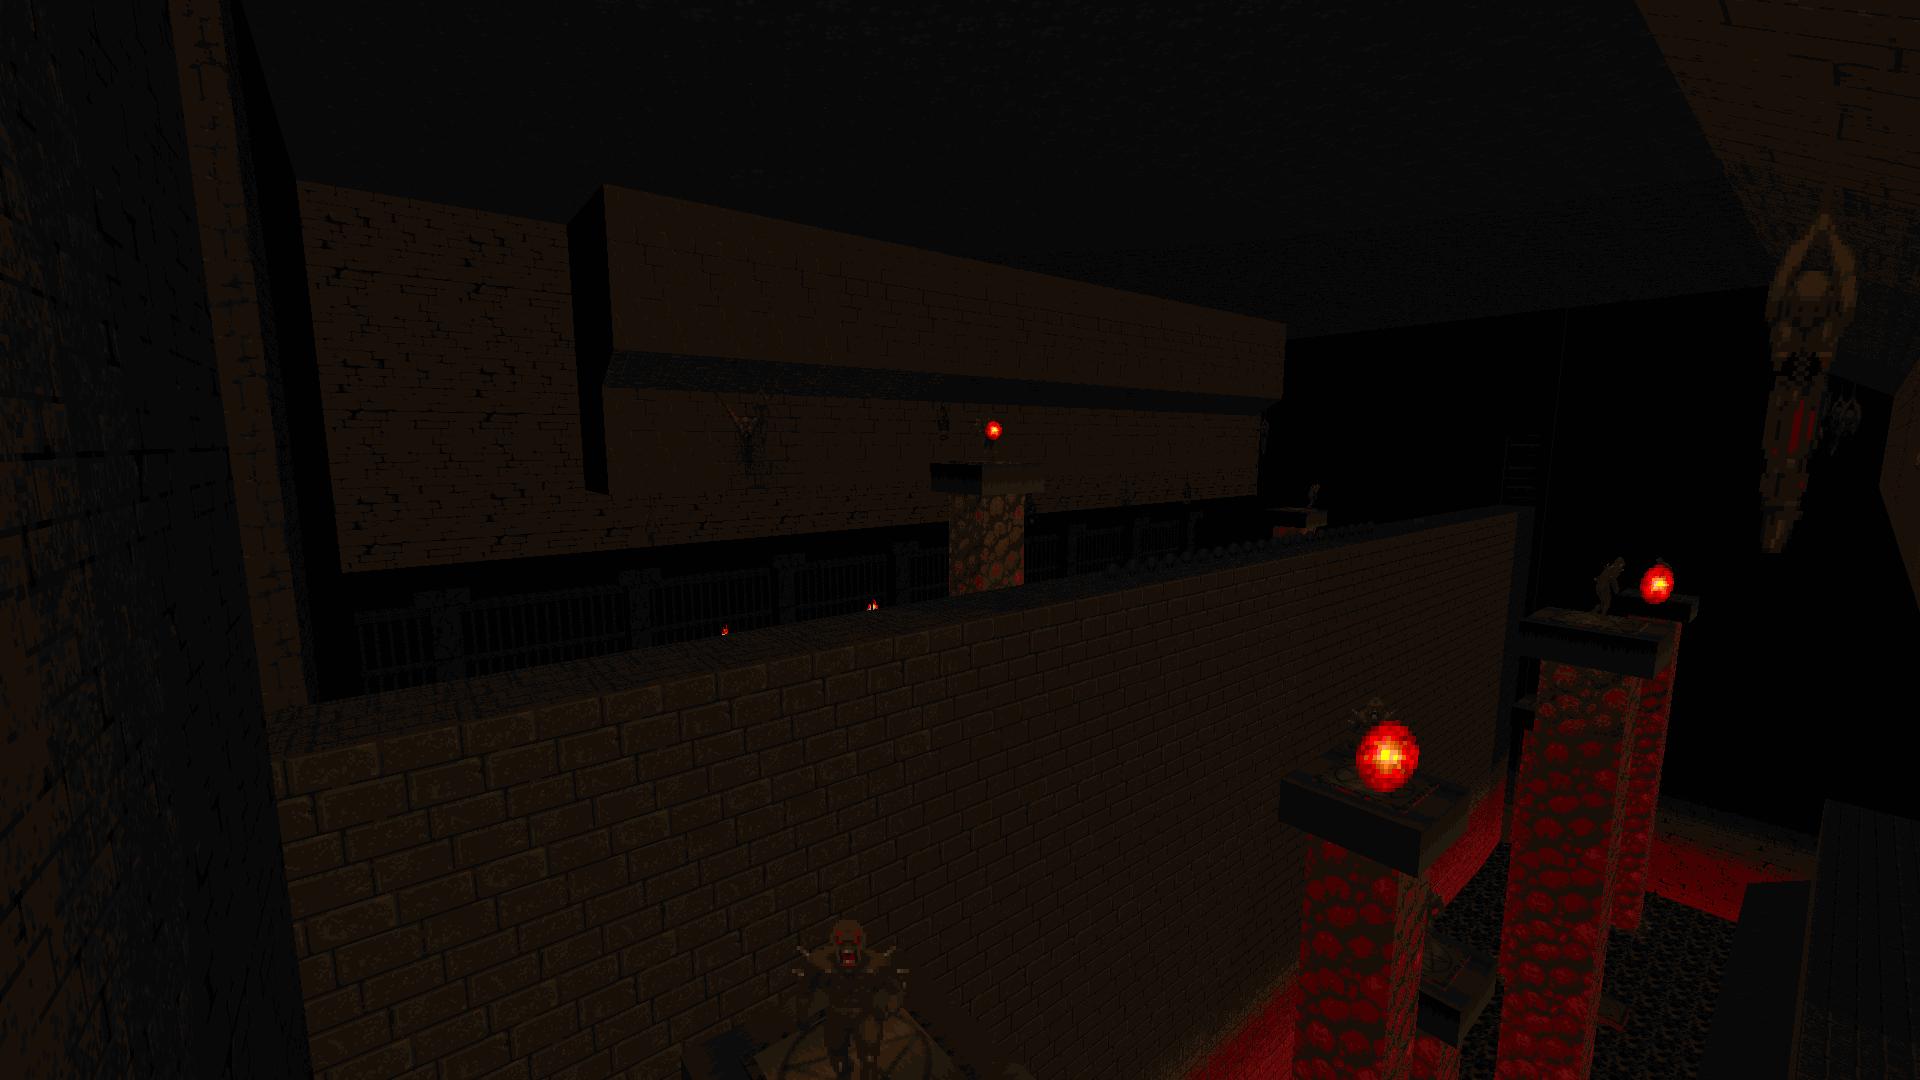 Screenshot_Doom_20200504_210120.png.4fc4a41cb8b5ae9b3d3ac1edb3af4928.png